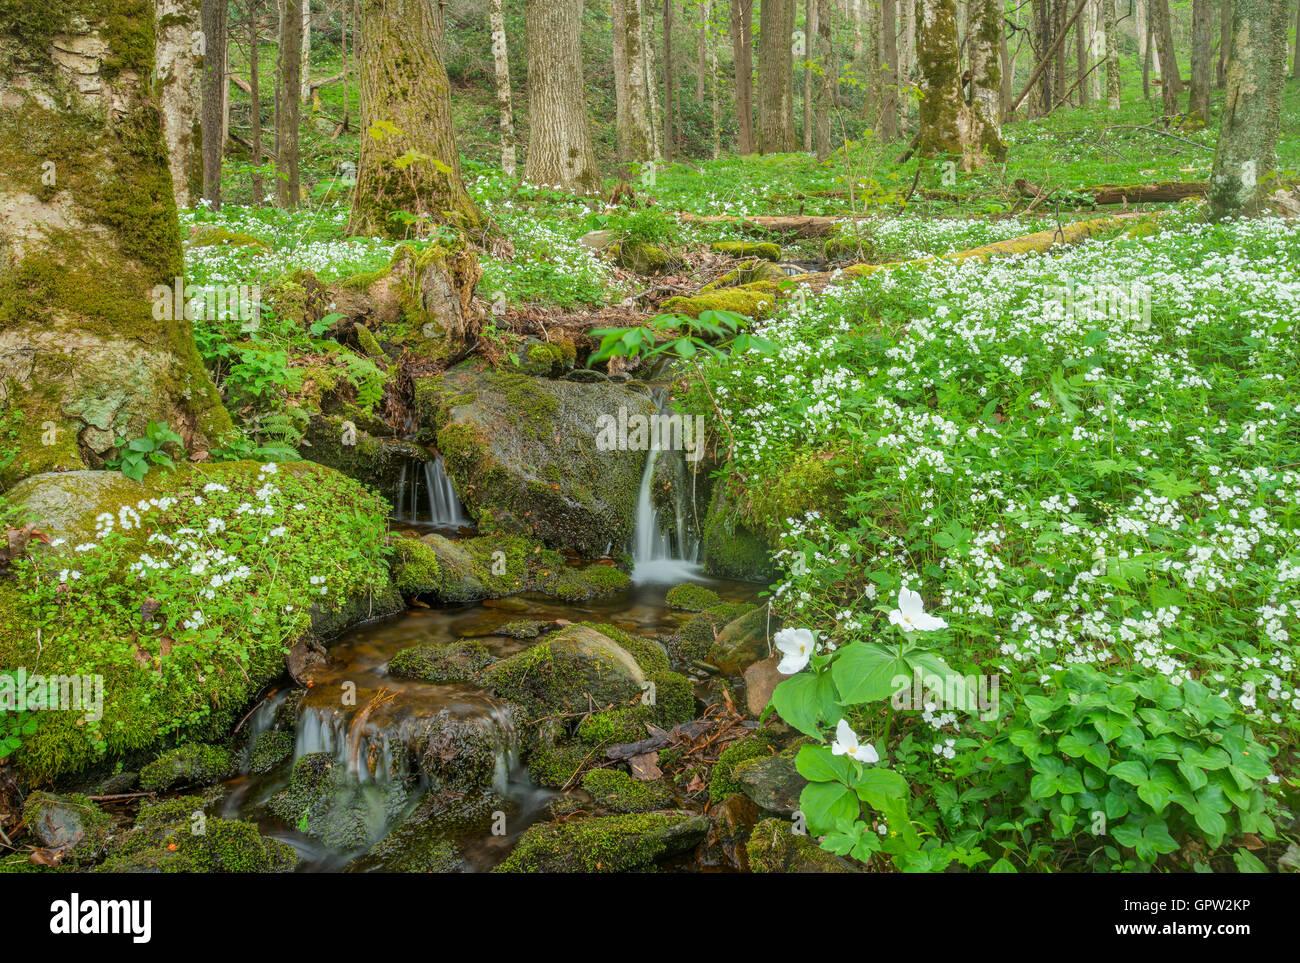 Large White-flowered trilliums (Trillium grandiflorum), stream, Spring, White-Fringed Phacelia (P.frimbiata), Great - Stock Image